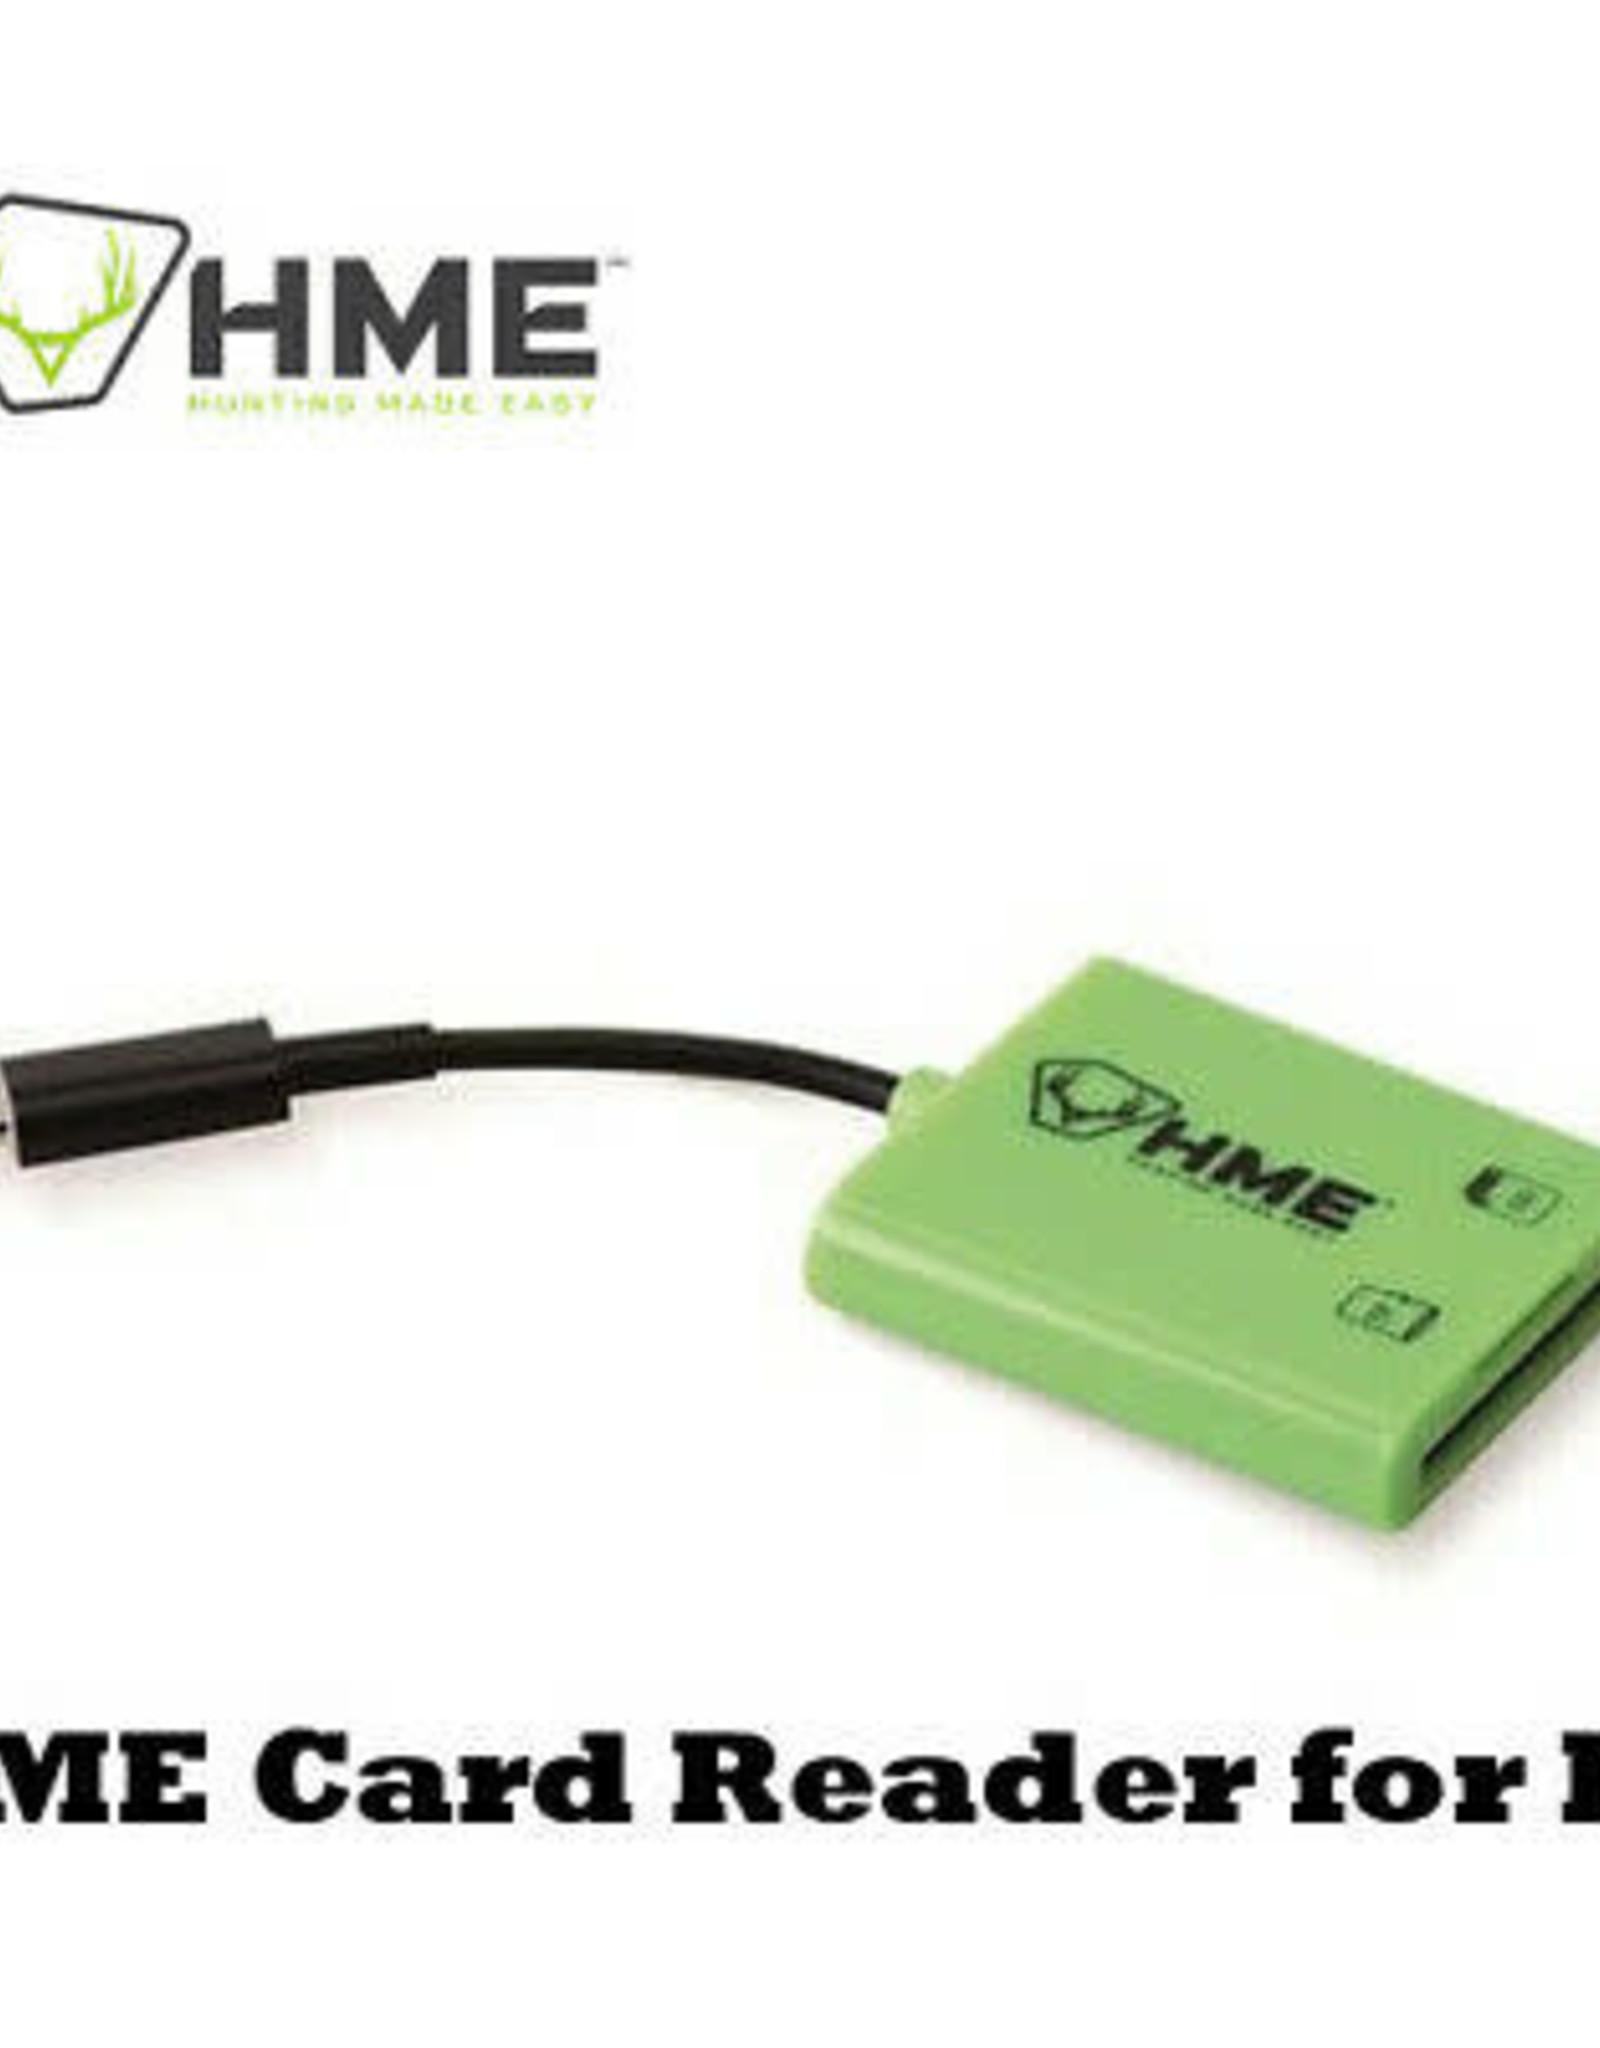 HME SD Card Reader For iOS Devices